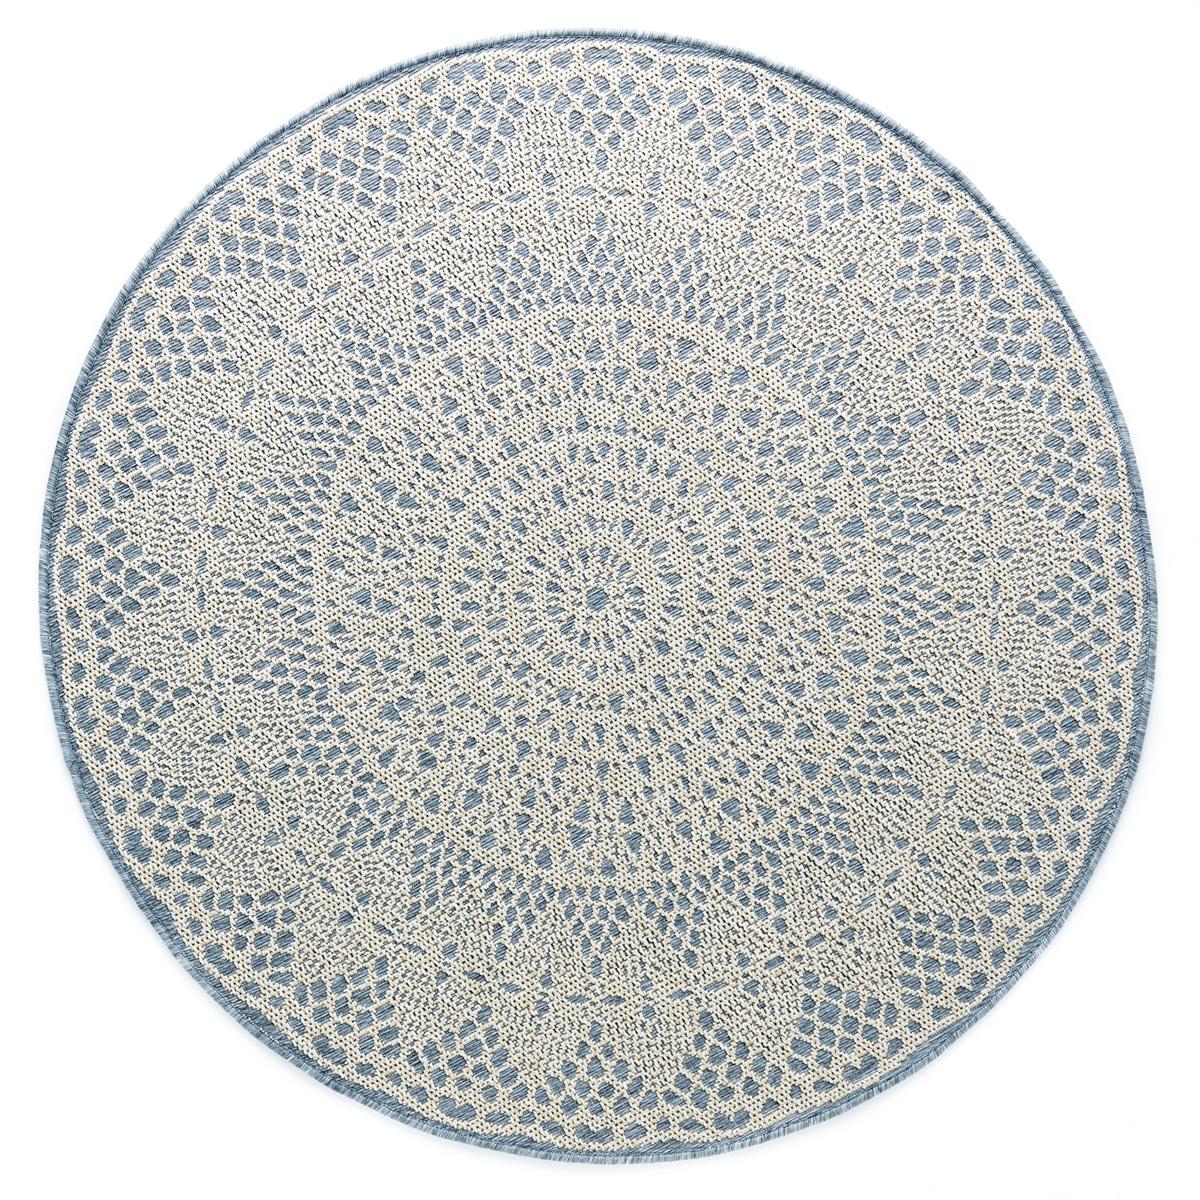 Tapis rond crochet gris 160x160